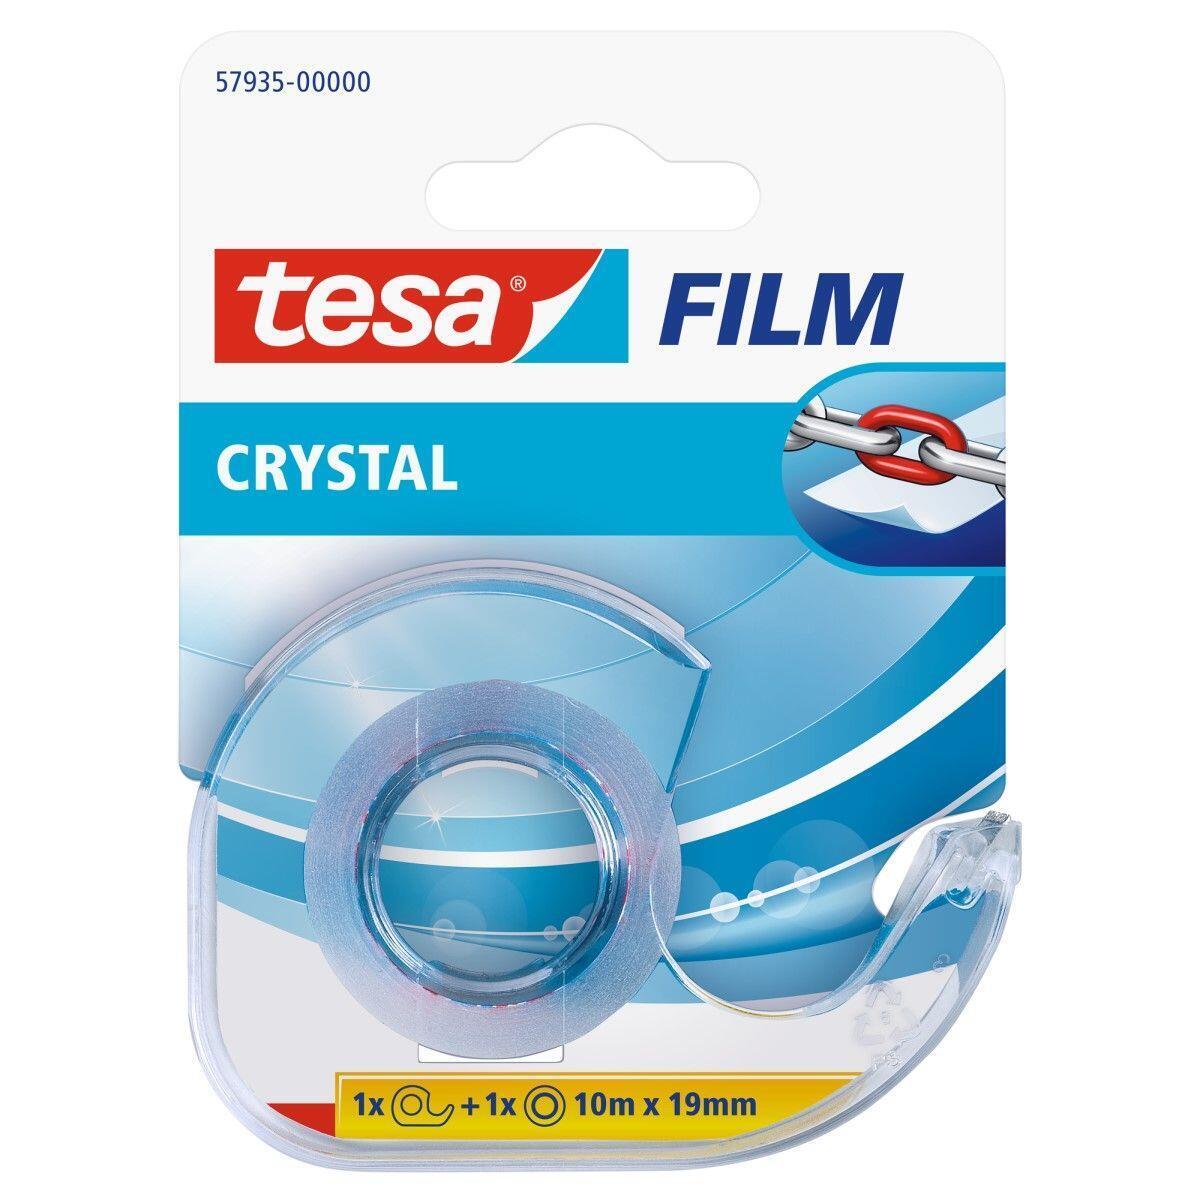 Nastro adesivo TESA tesafilm 117 mm x 0.019 m trasparente - 4